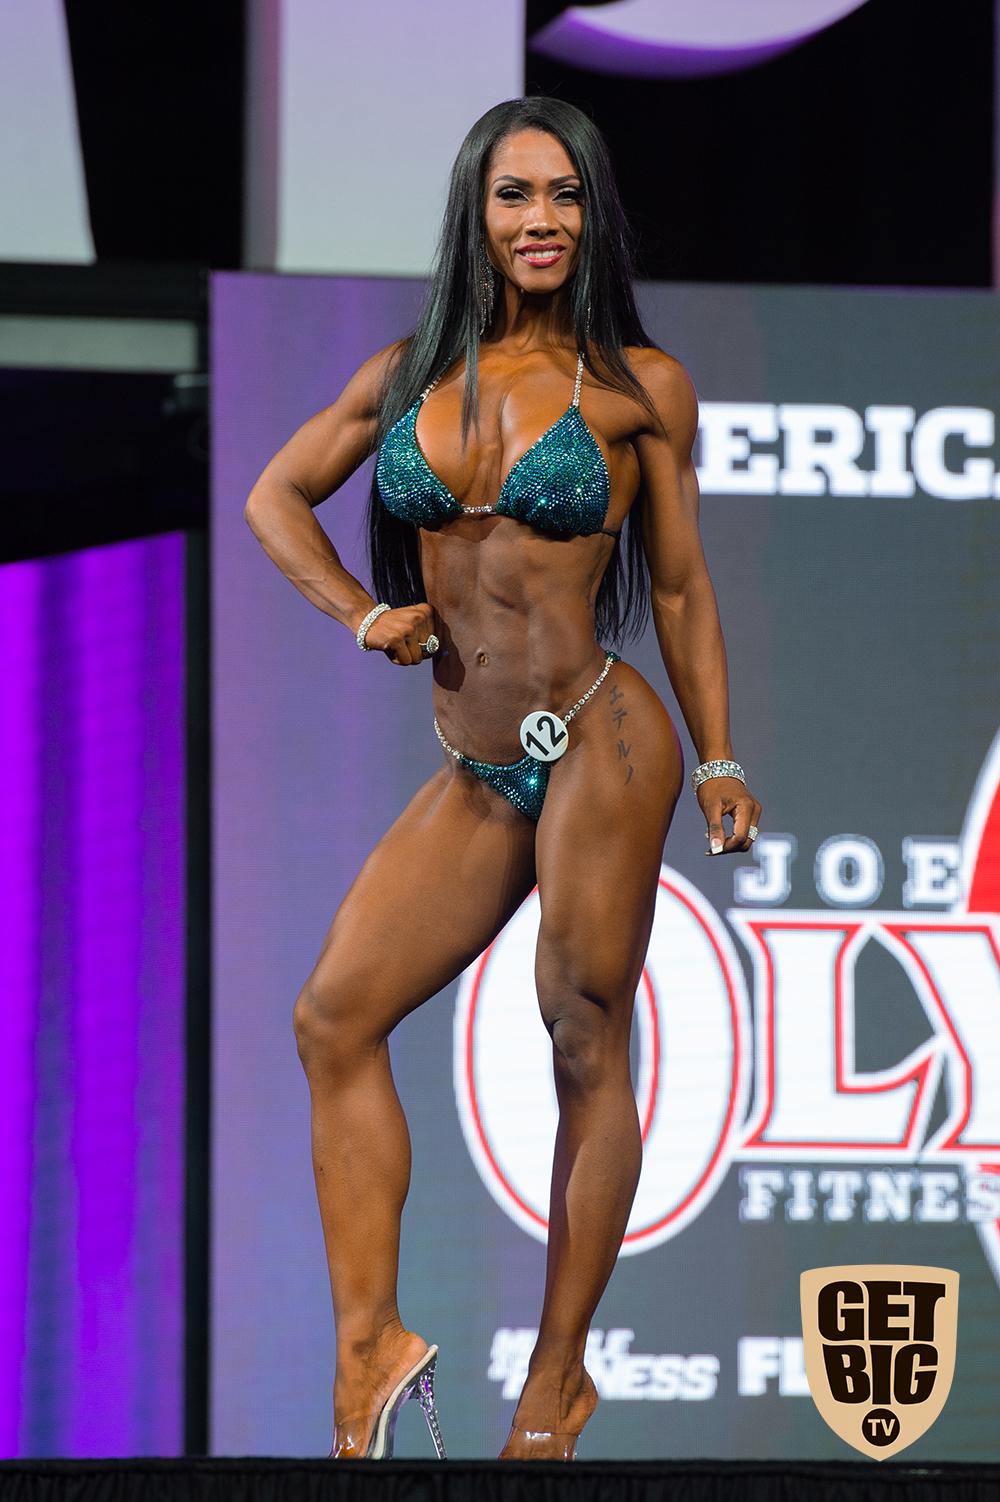 Marcia Goncalves / USA - 9 место «Bikini Olympia»-2018